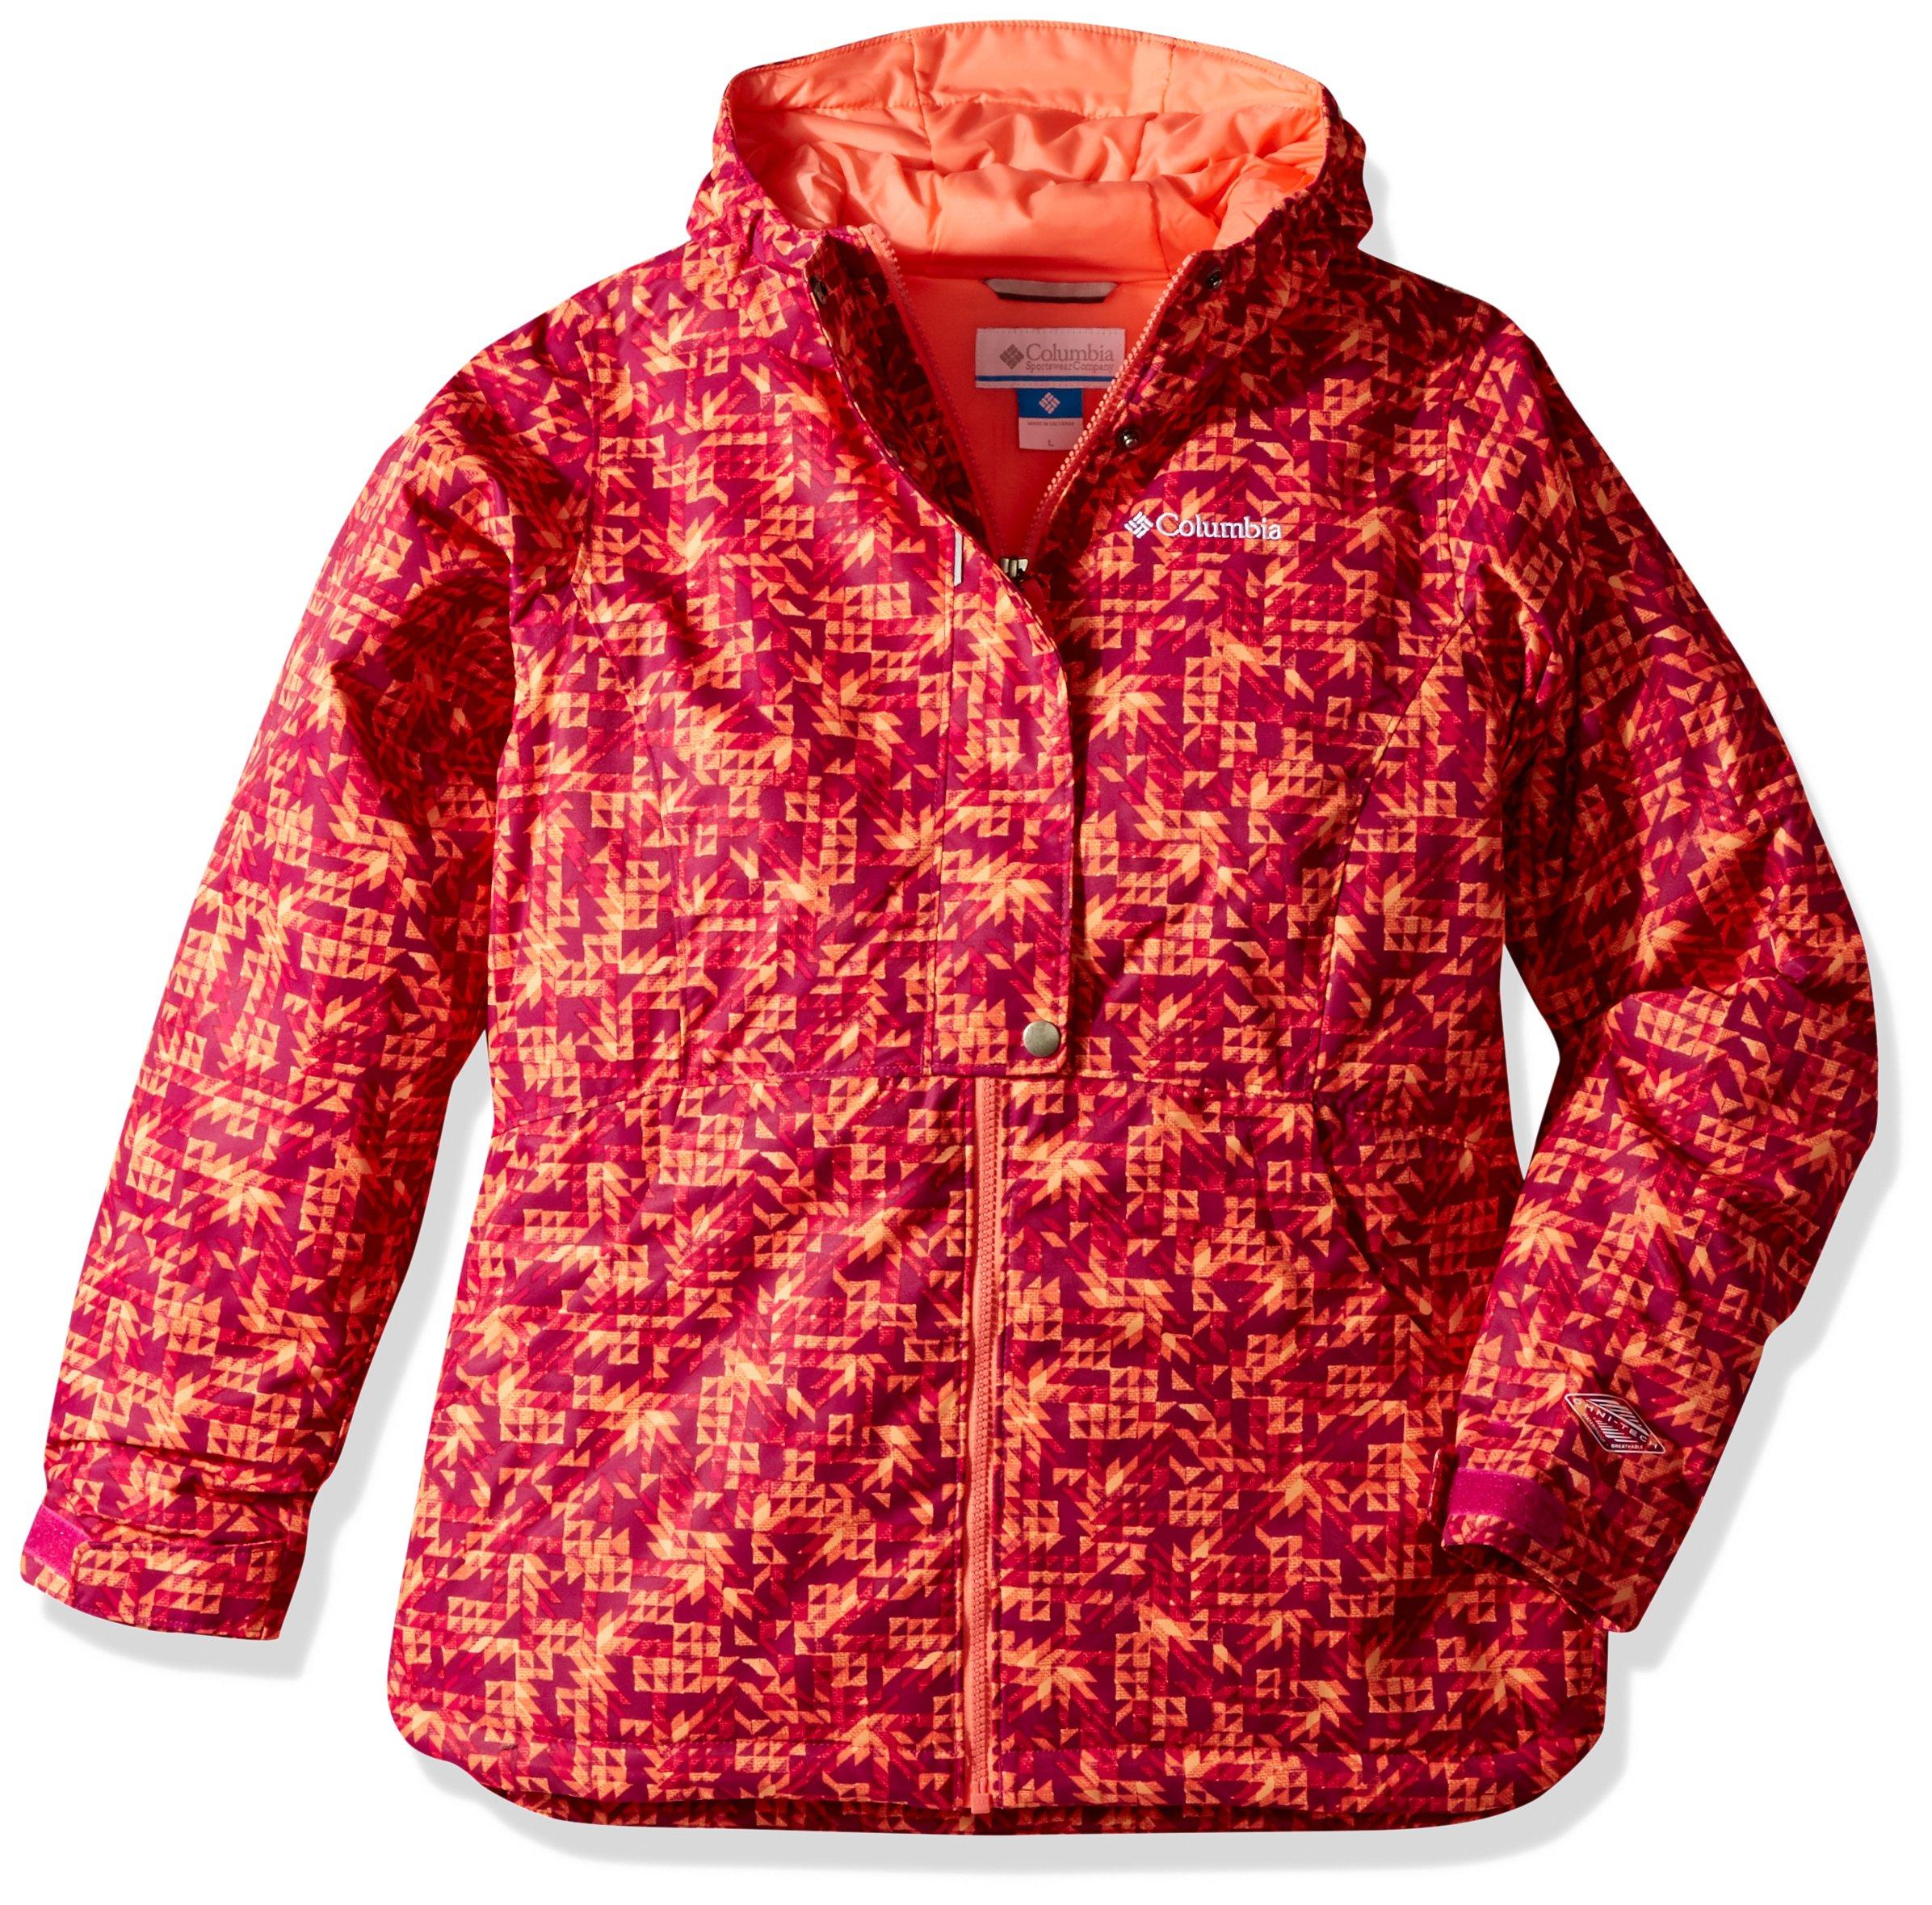 Columbia Girls Snowcation Nation Jacket, Deep Blush Checkers Print, Medium by Columbia